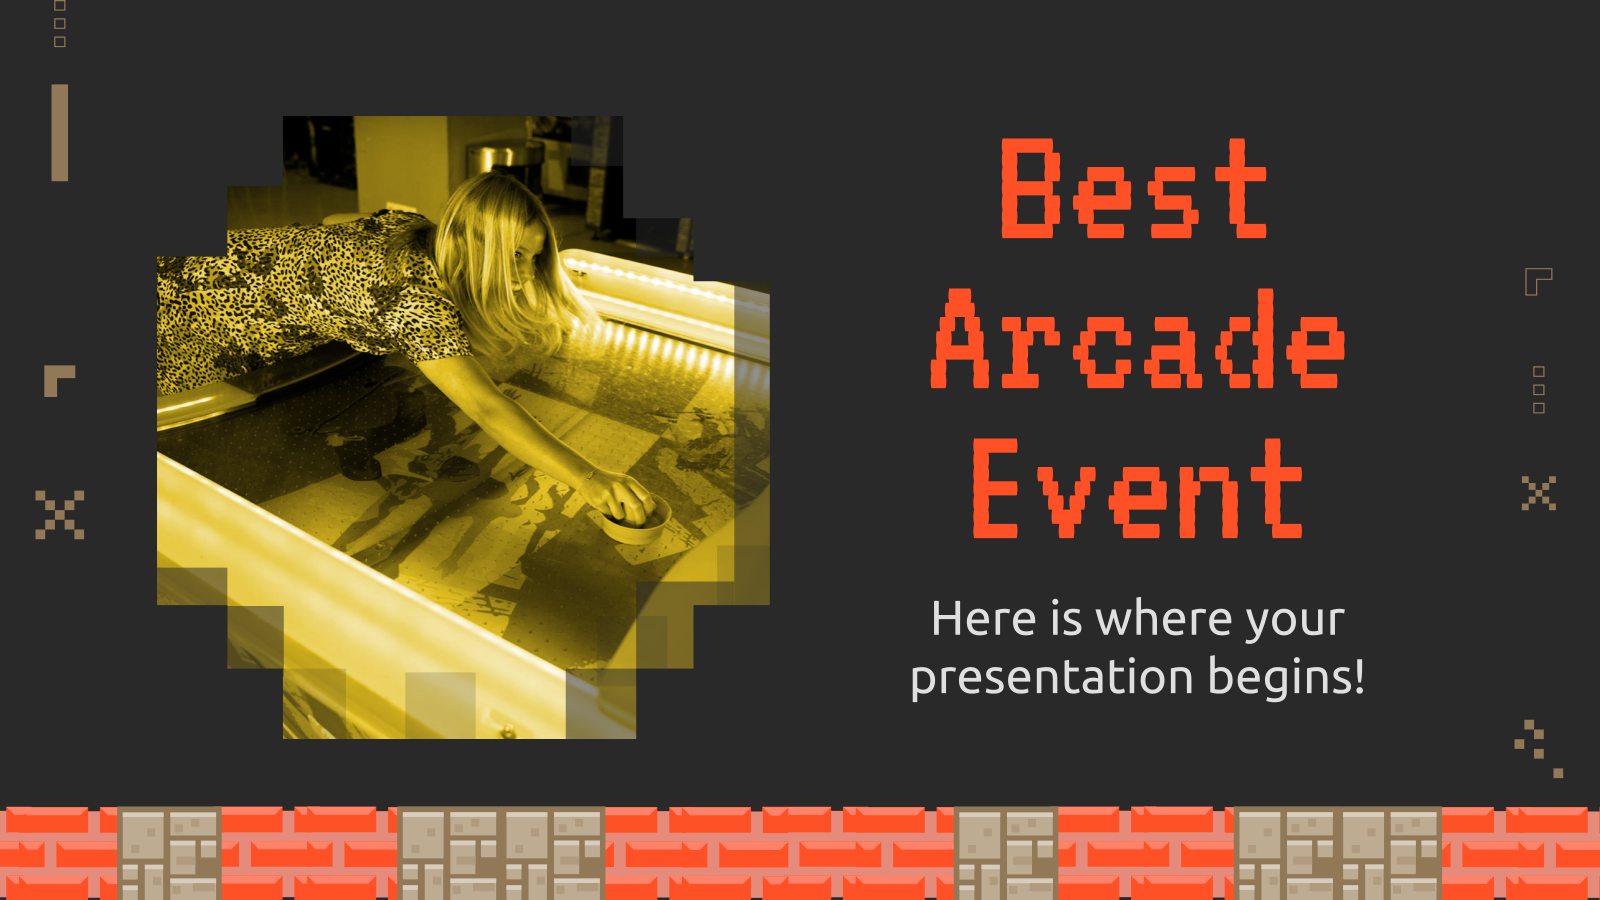 Best Arcade Event presentation template